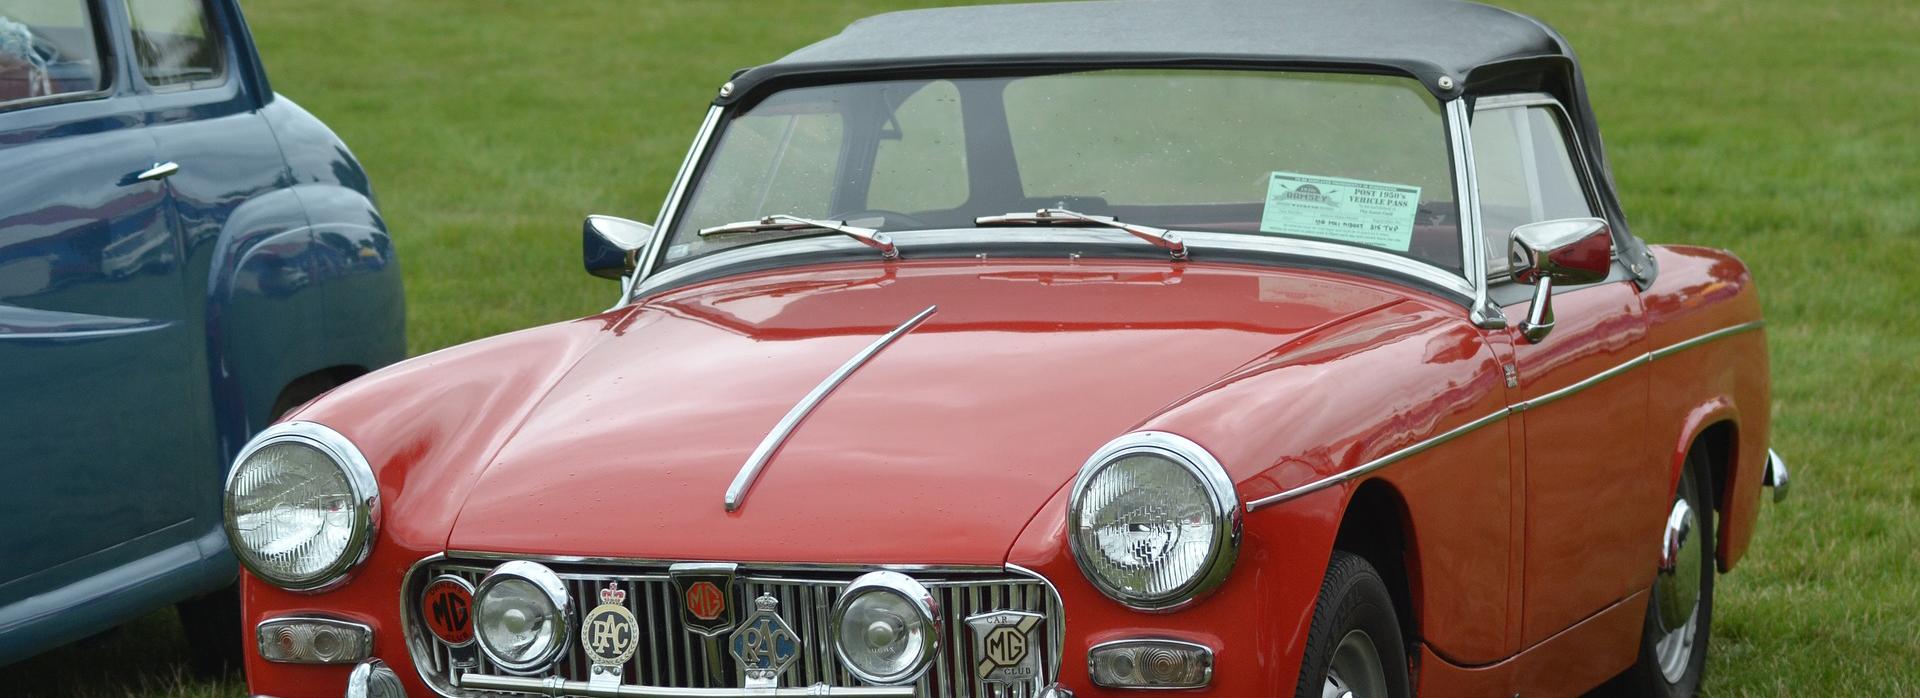 Classic Car in Pembroke Pines Florida - CarDonations4Cancer.org